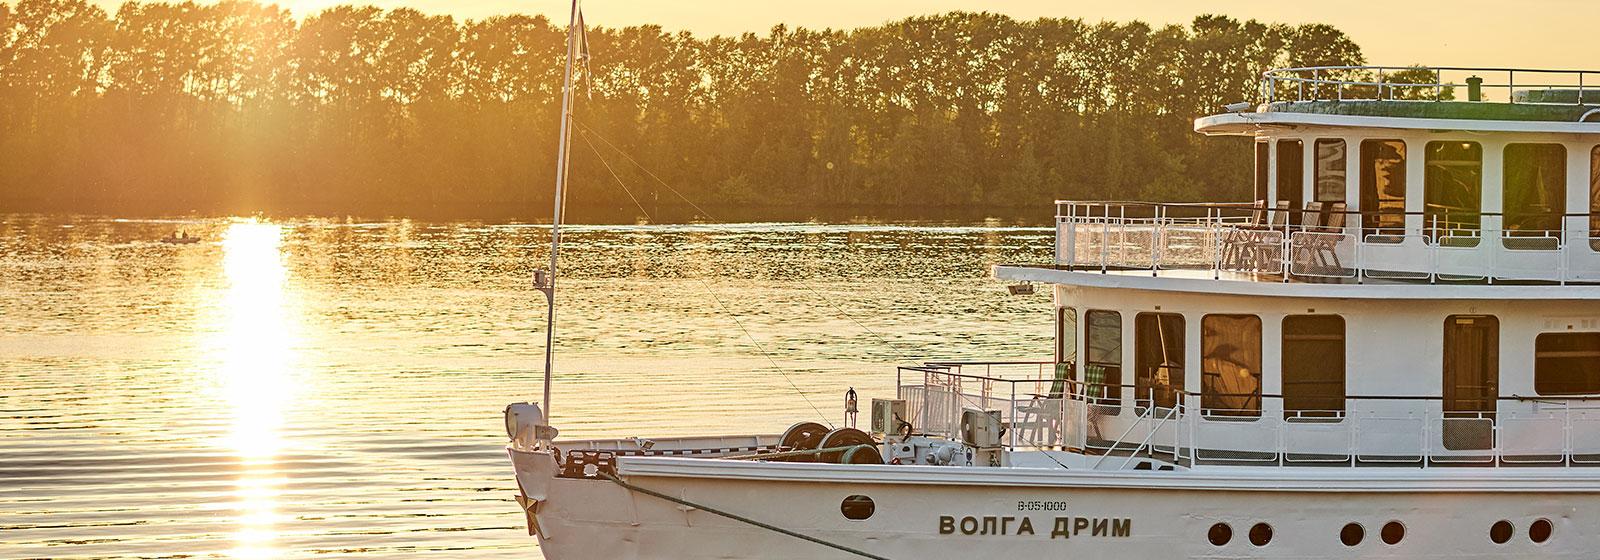 Volga Dream Cruise Ship